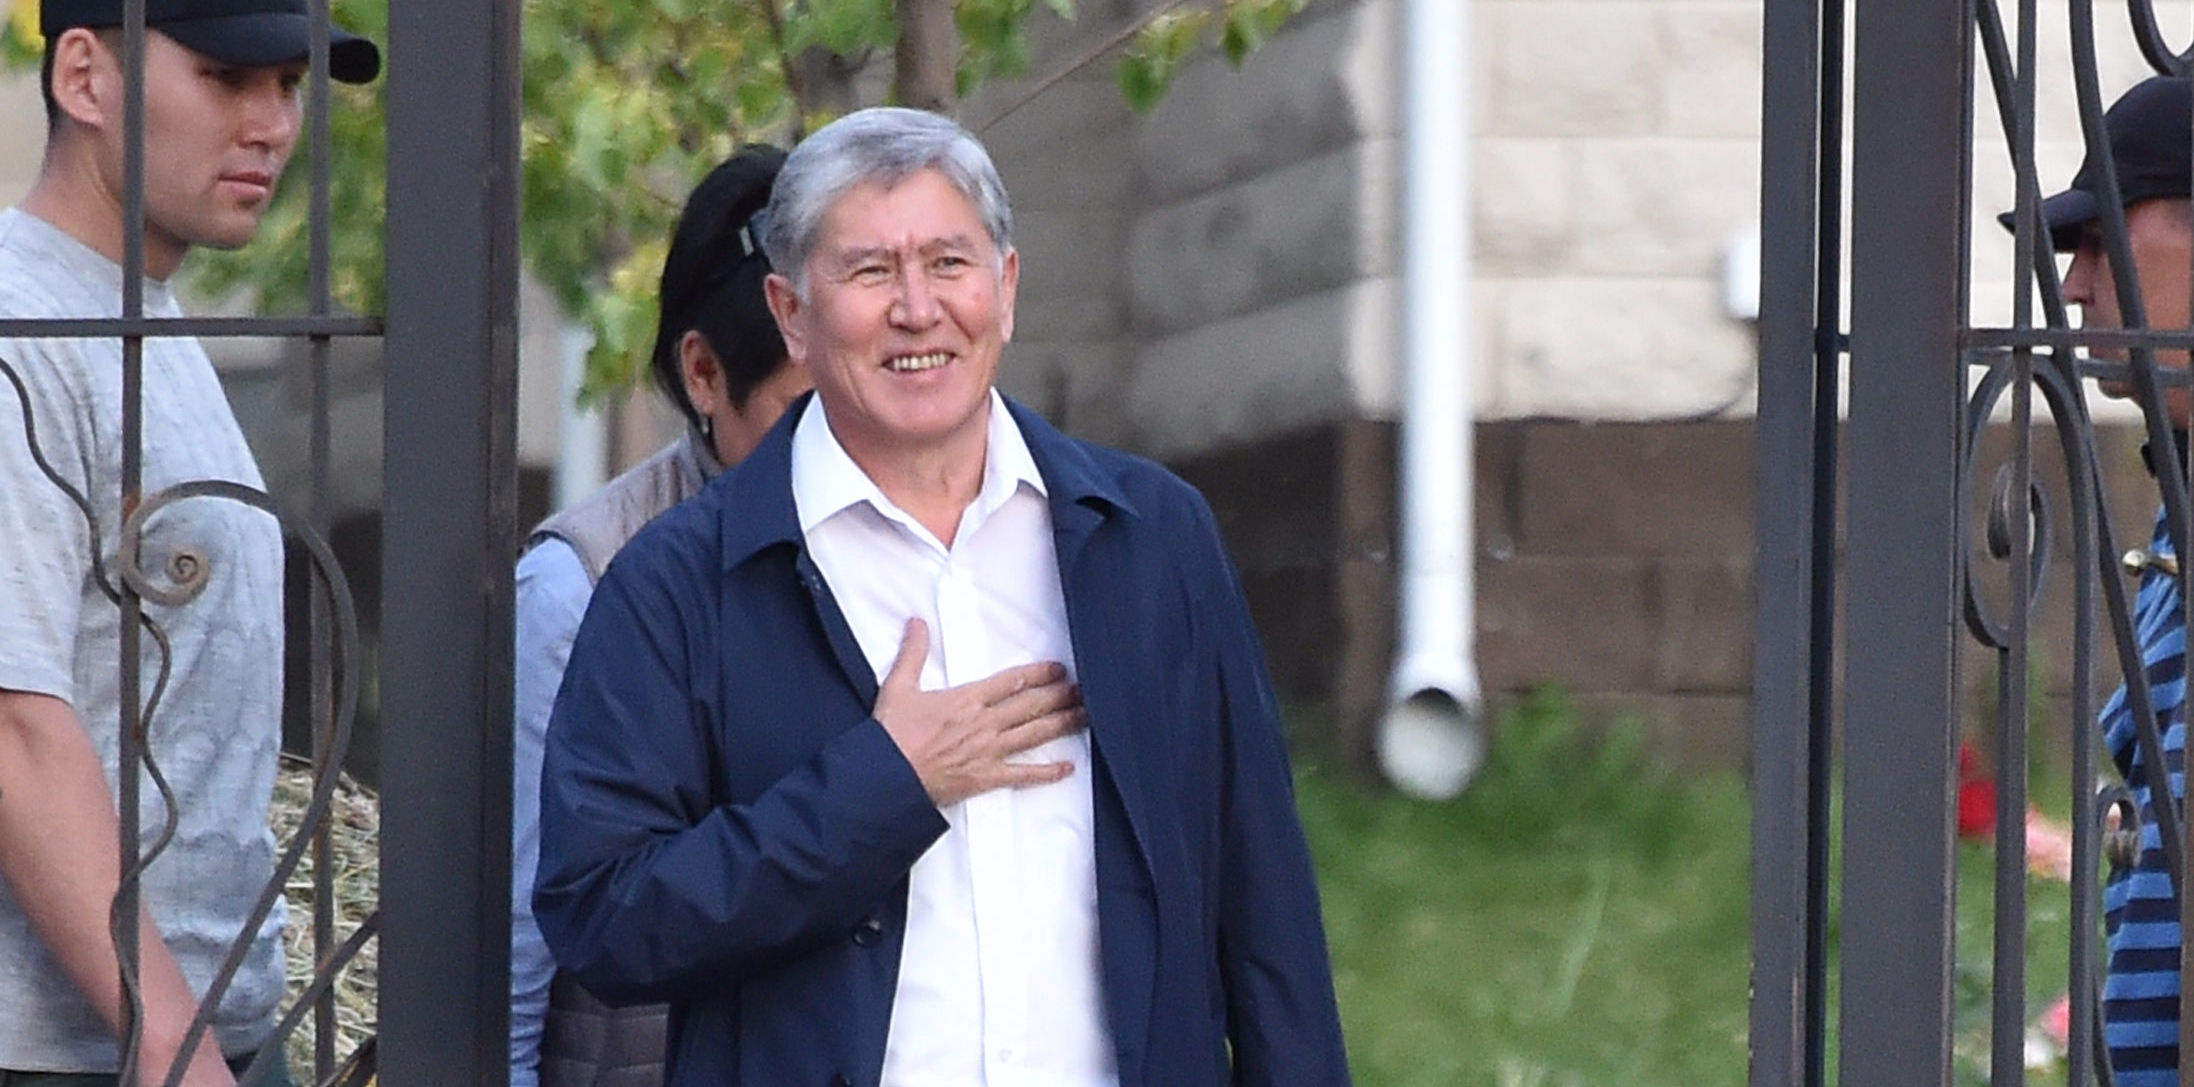 In this file photo taken on June 27, 2019 Former Kyrgyz president Almazbek Atambayev stands at the entrance to his residence in the village of Koi-Tash near the capital Bishkek